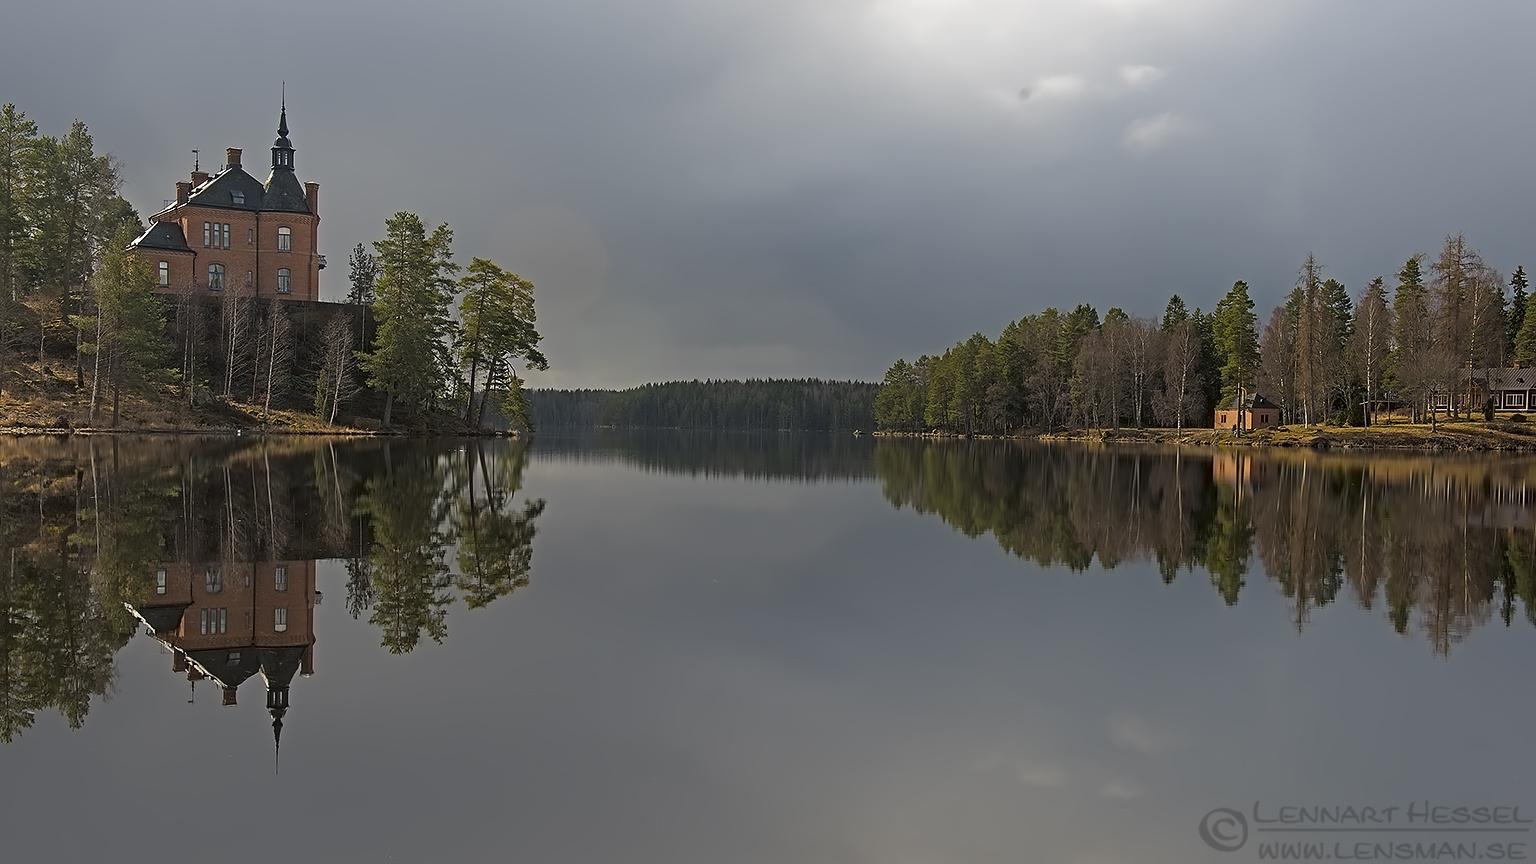 Ängelsberg intimate landscape